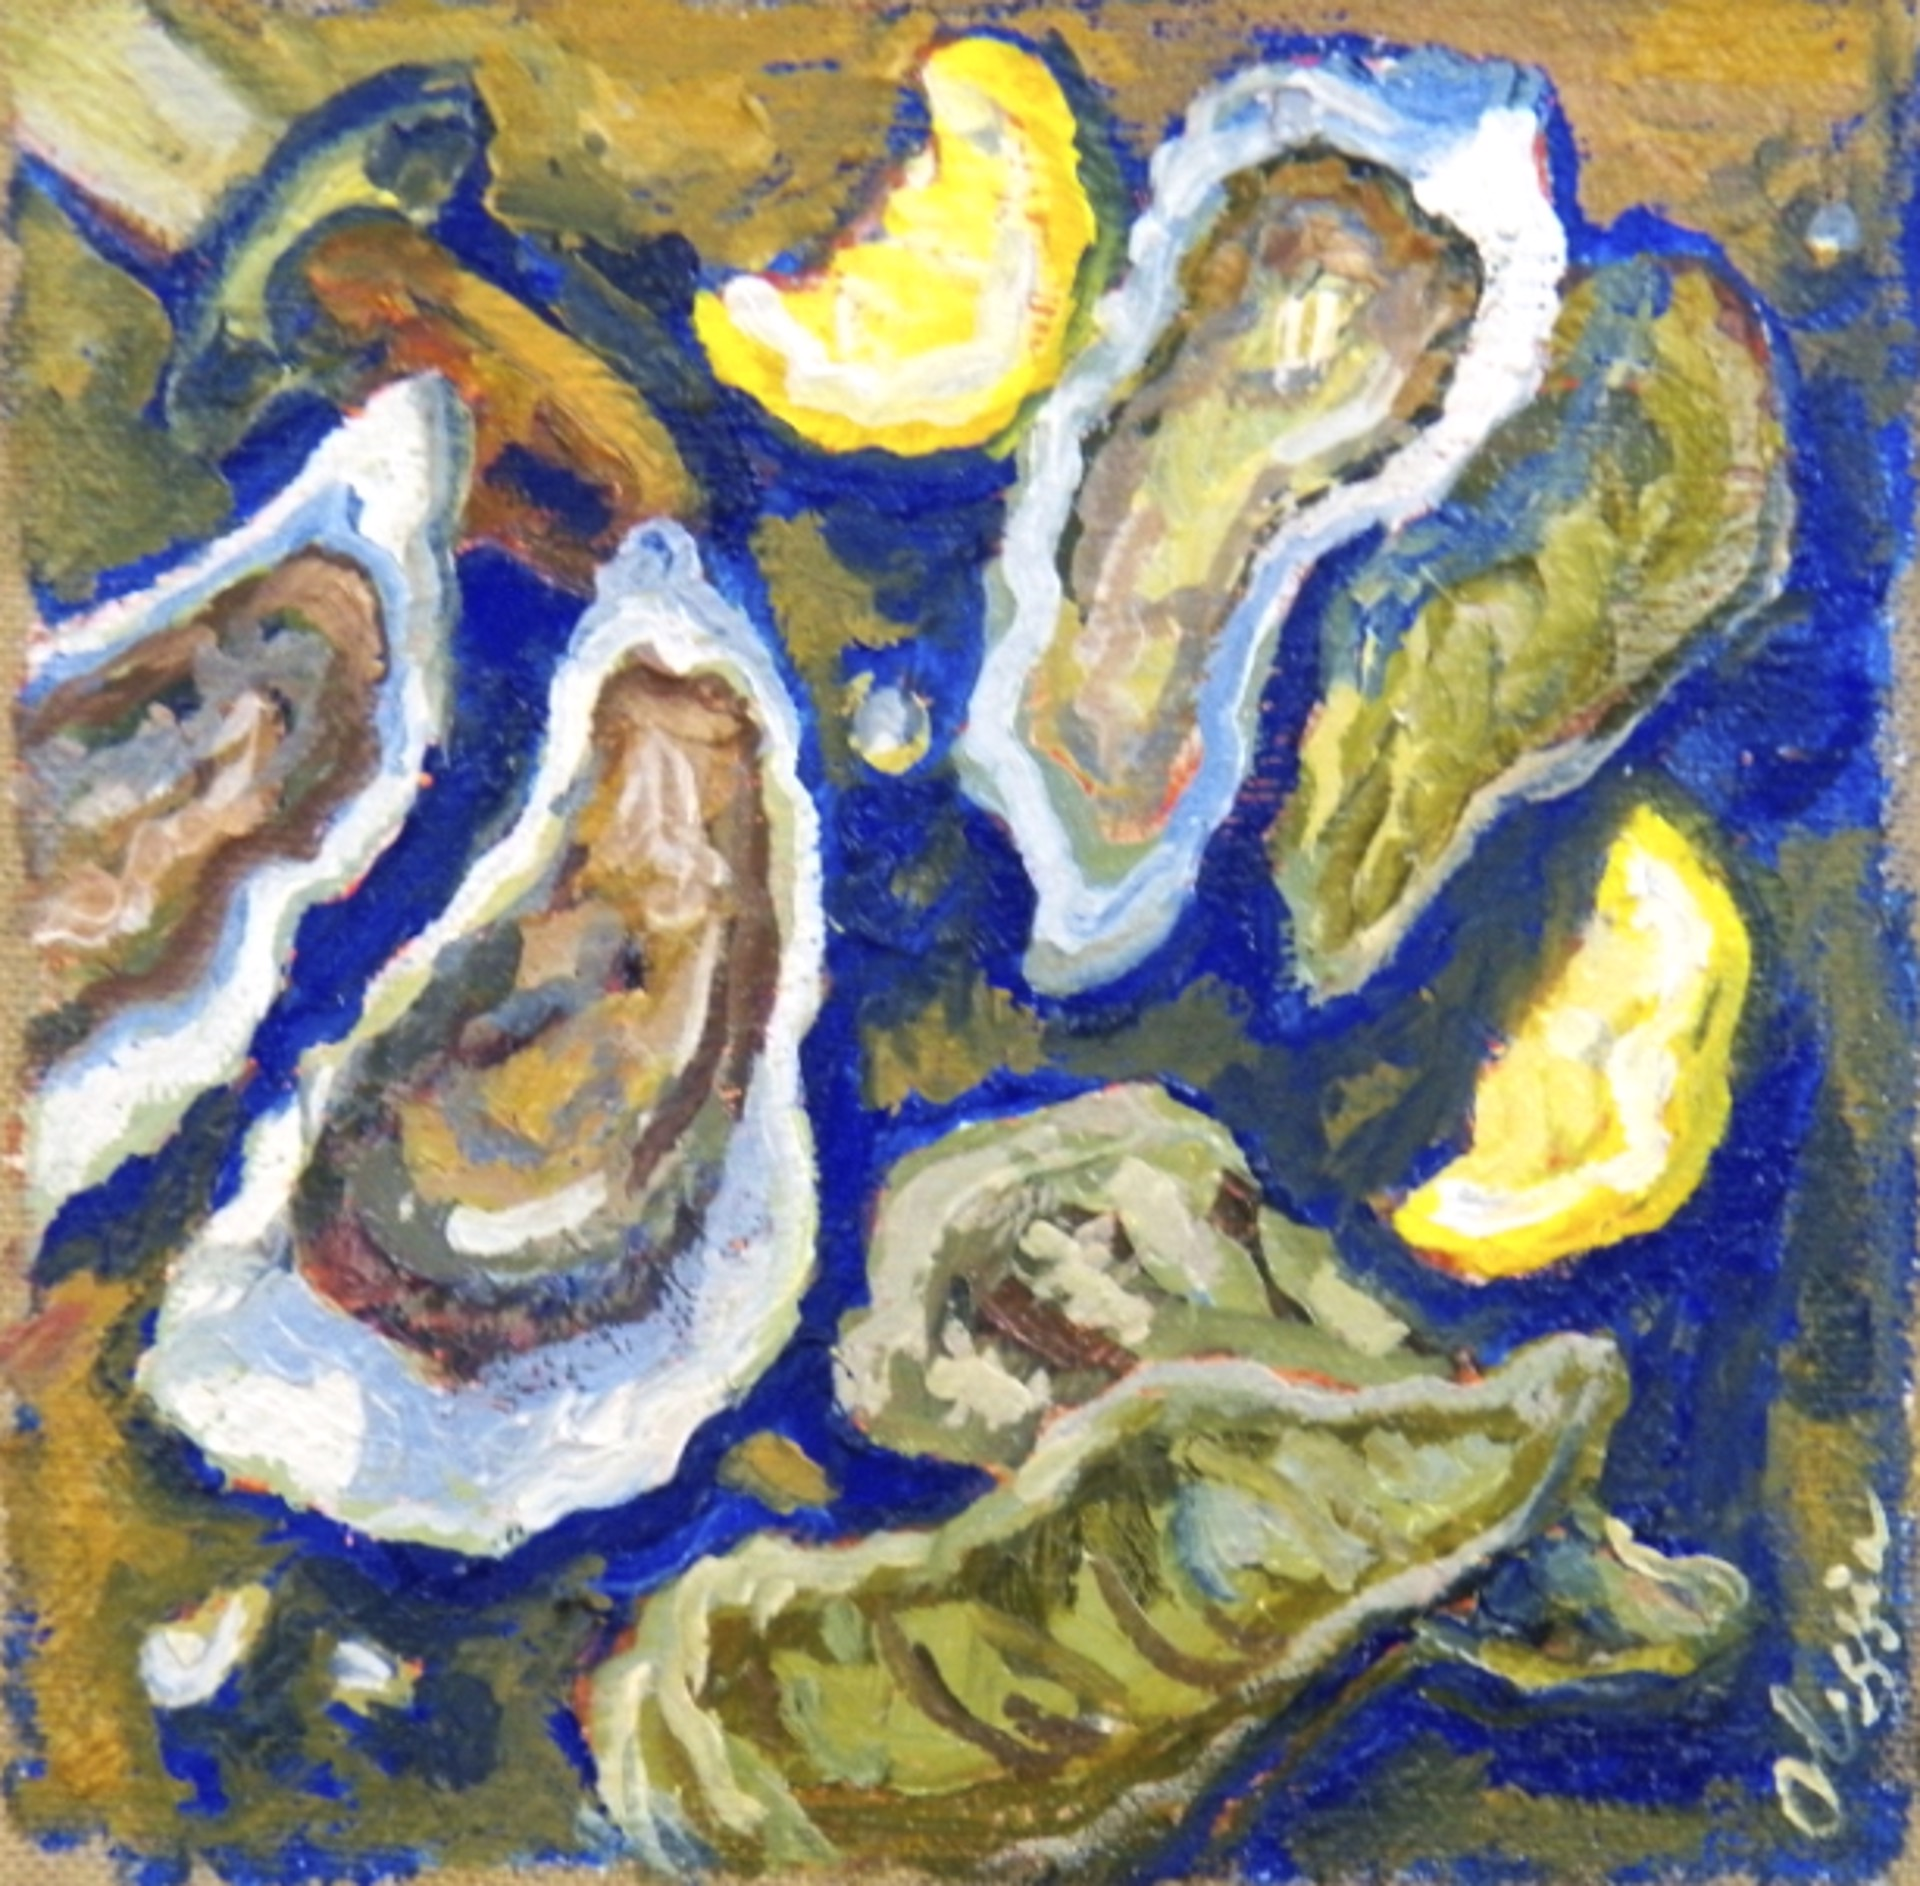 Blue Oysters II by Olessia Maximenko